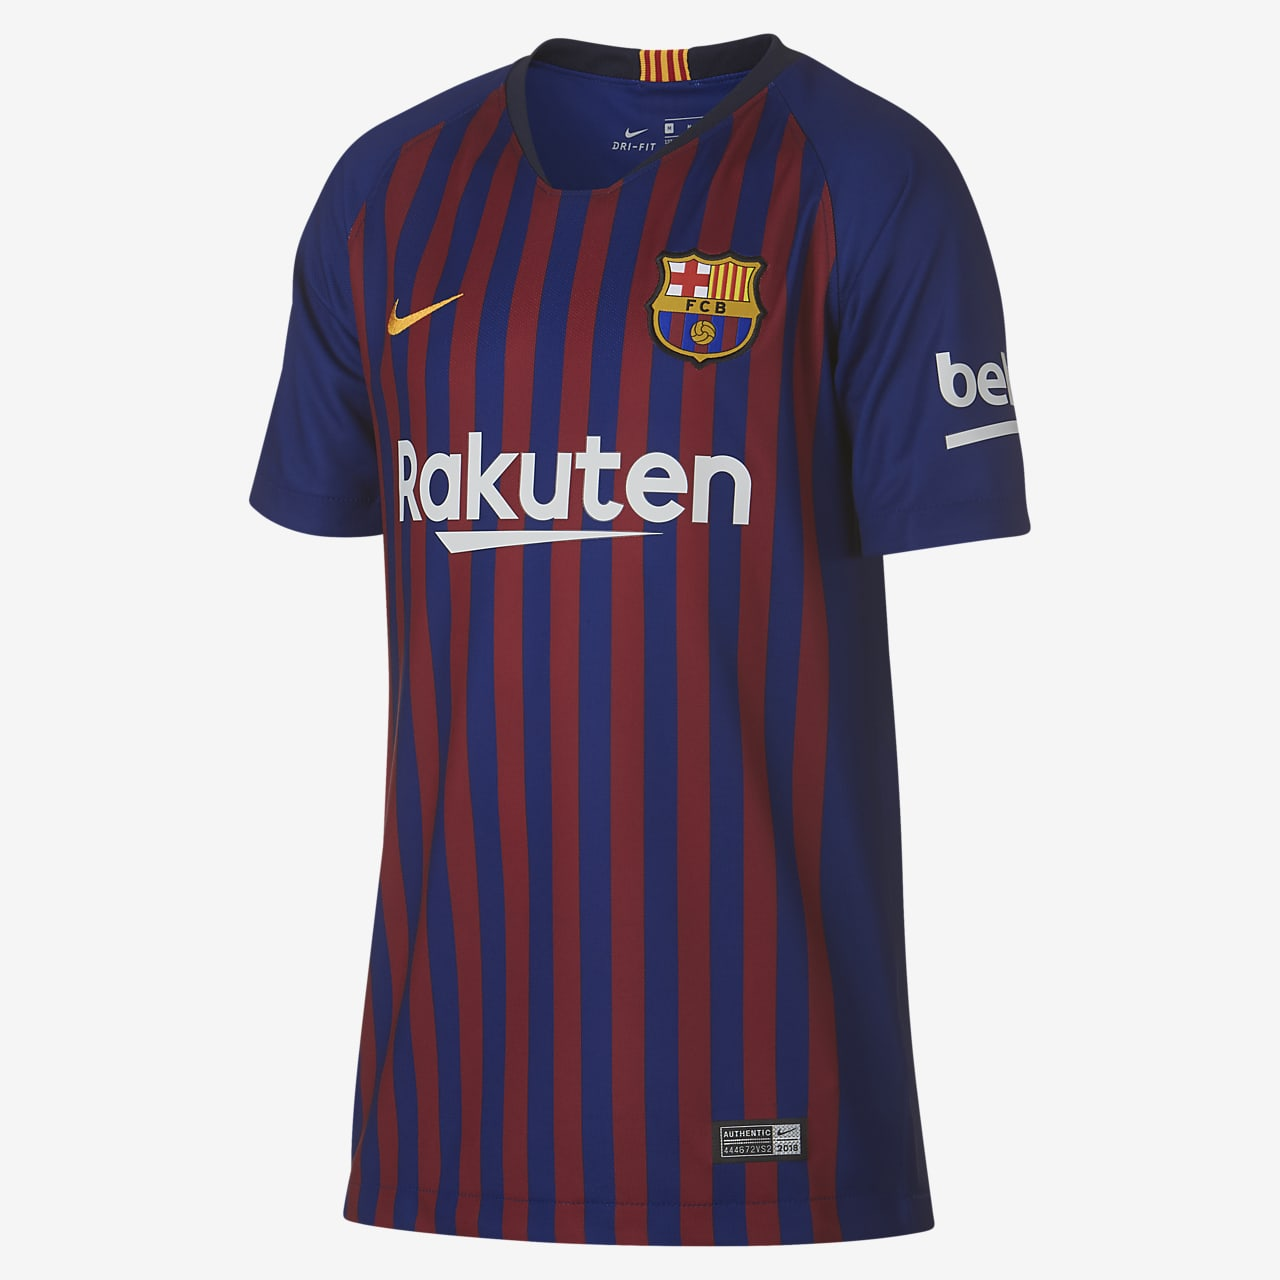 2018/19 FC Barcelona Stadium Home Fußballtrikot für ältere Kinder